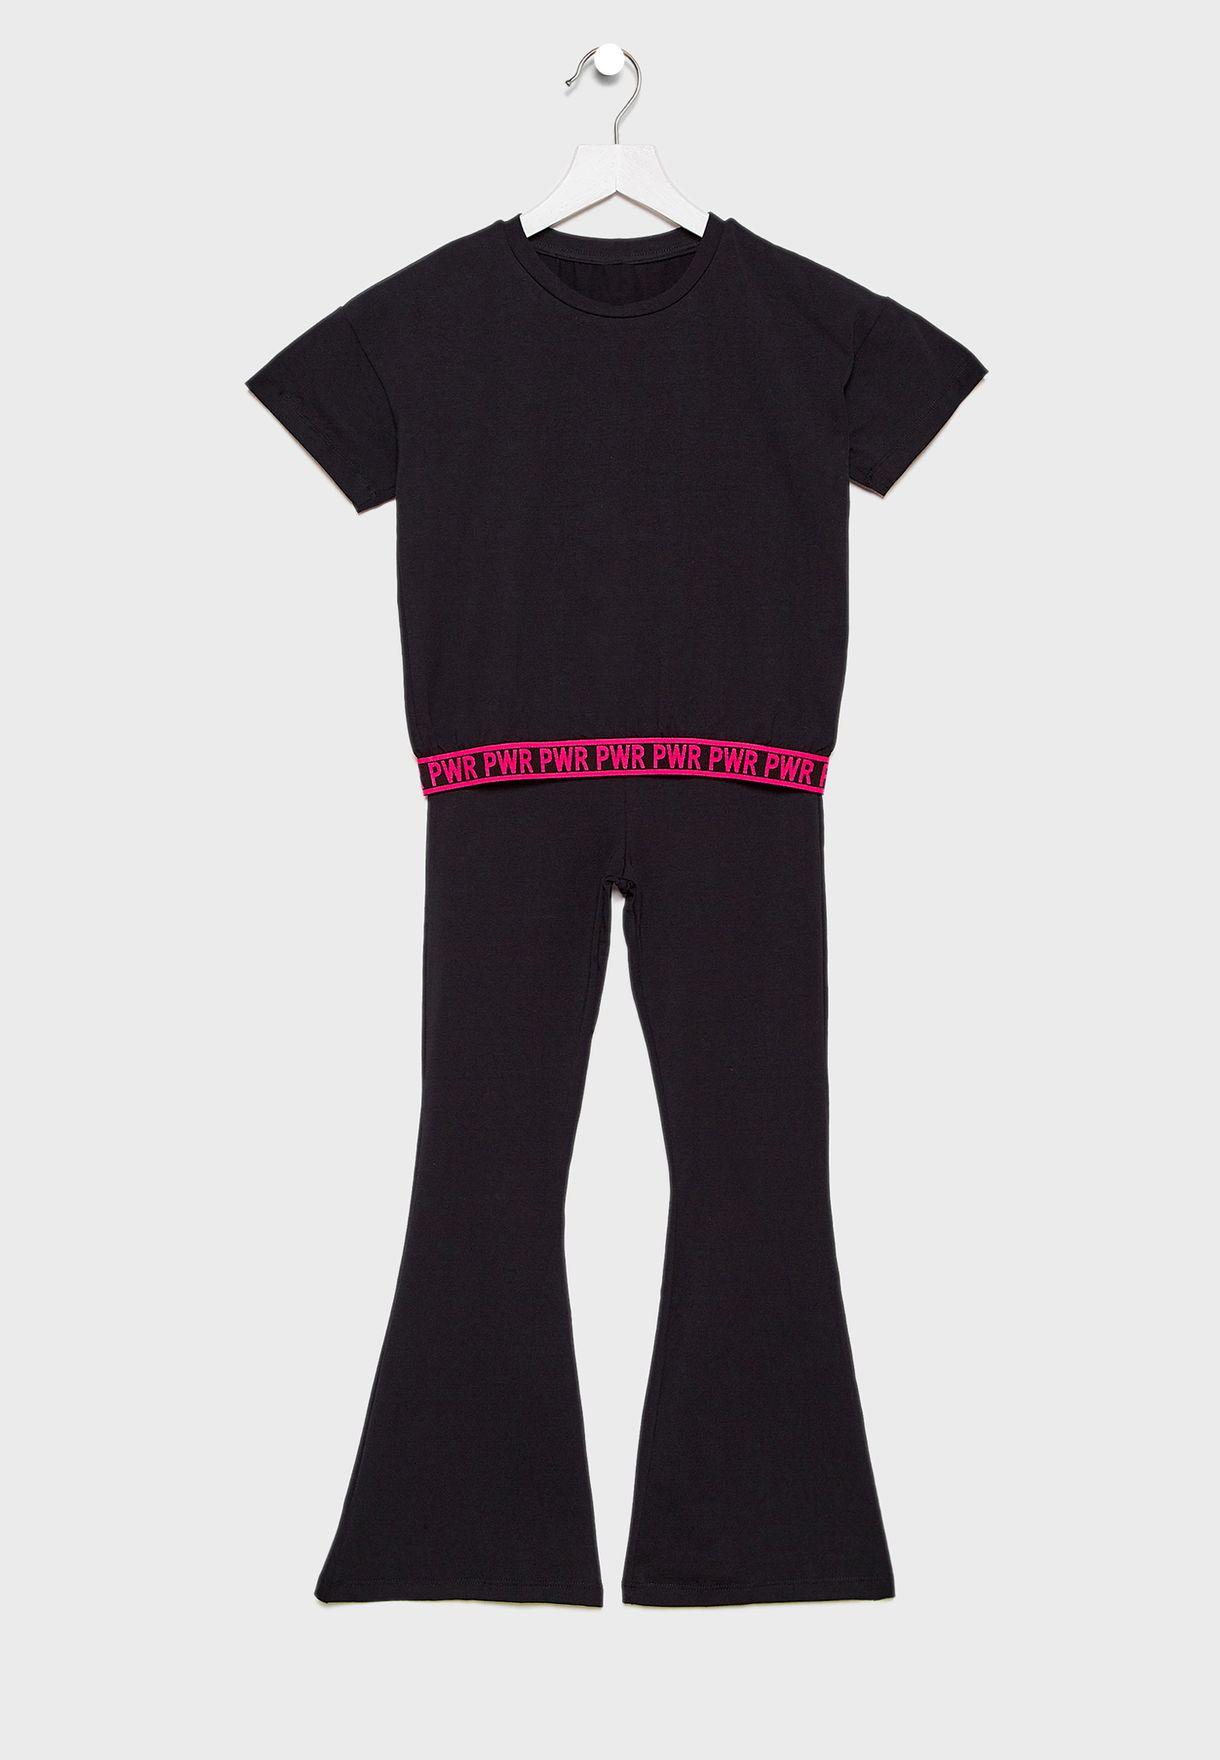 Kids Slogan Top + Trouser Set